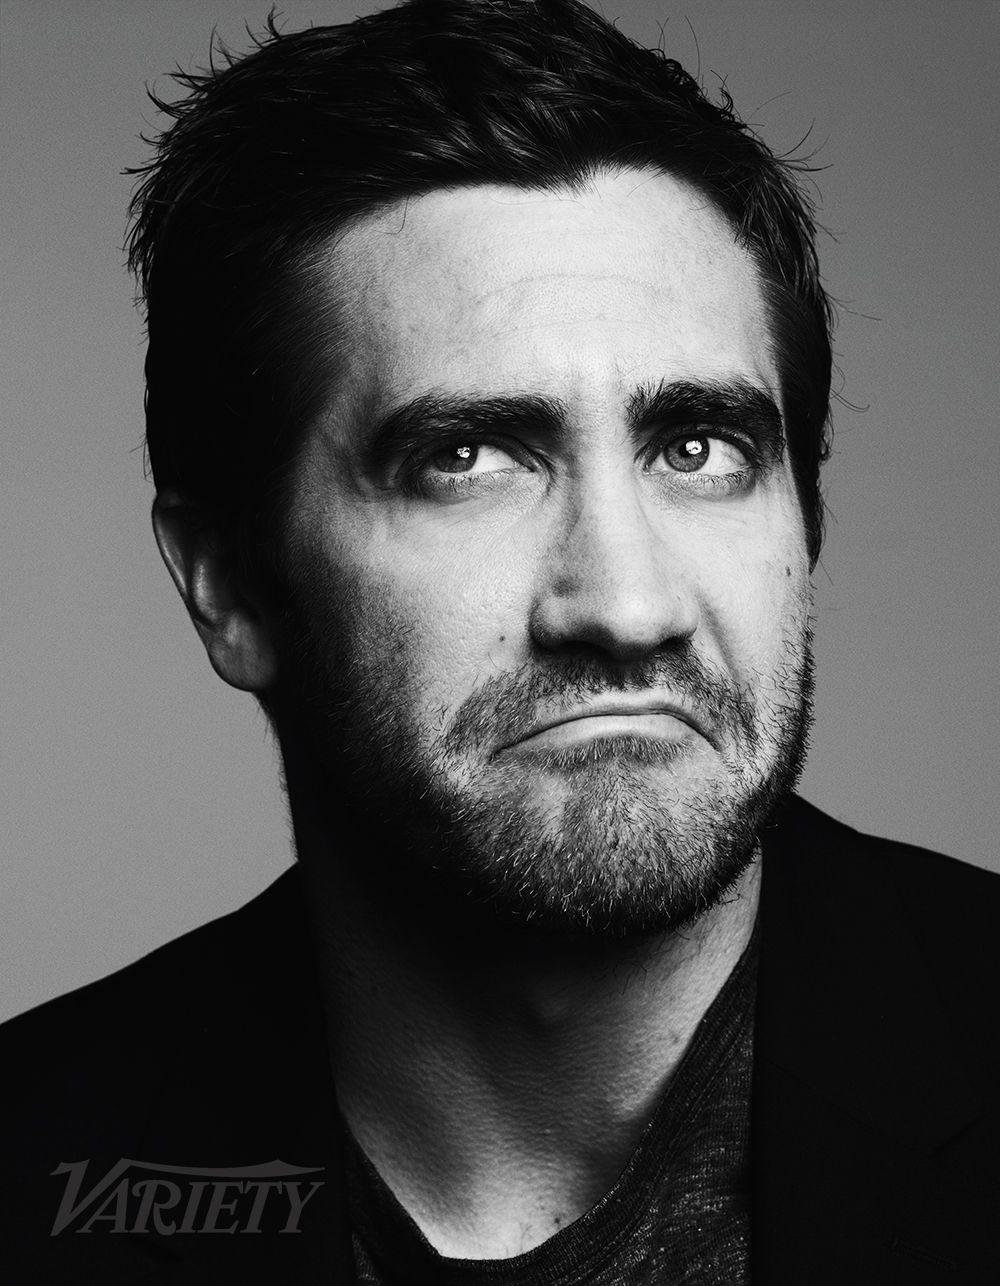 Jake Gyllenhaal,photographed byBen Hassett for Variety, Dec 2014.